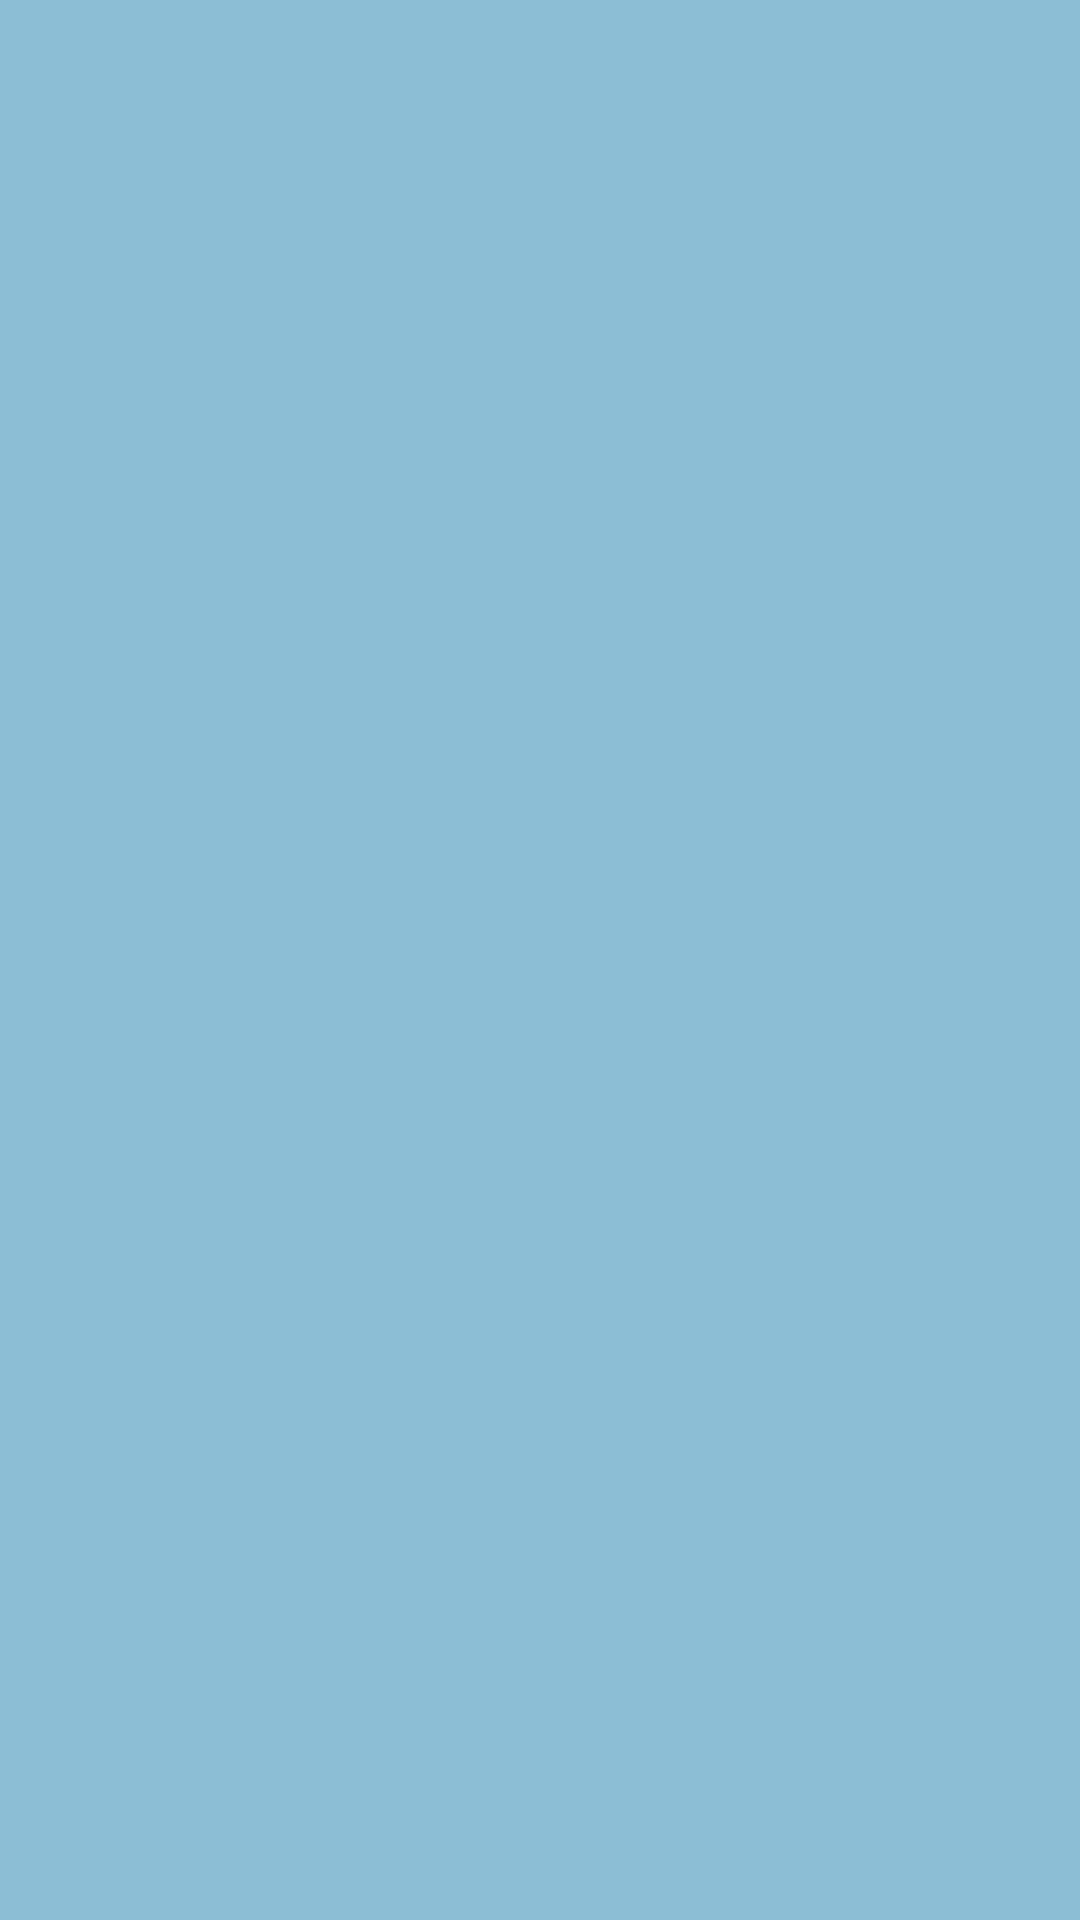 1080x1920 Dark Sky Blue Solid Color Background